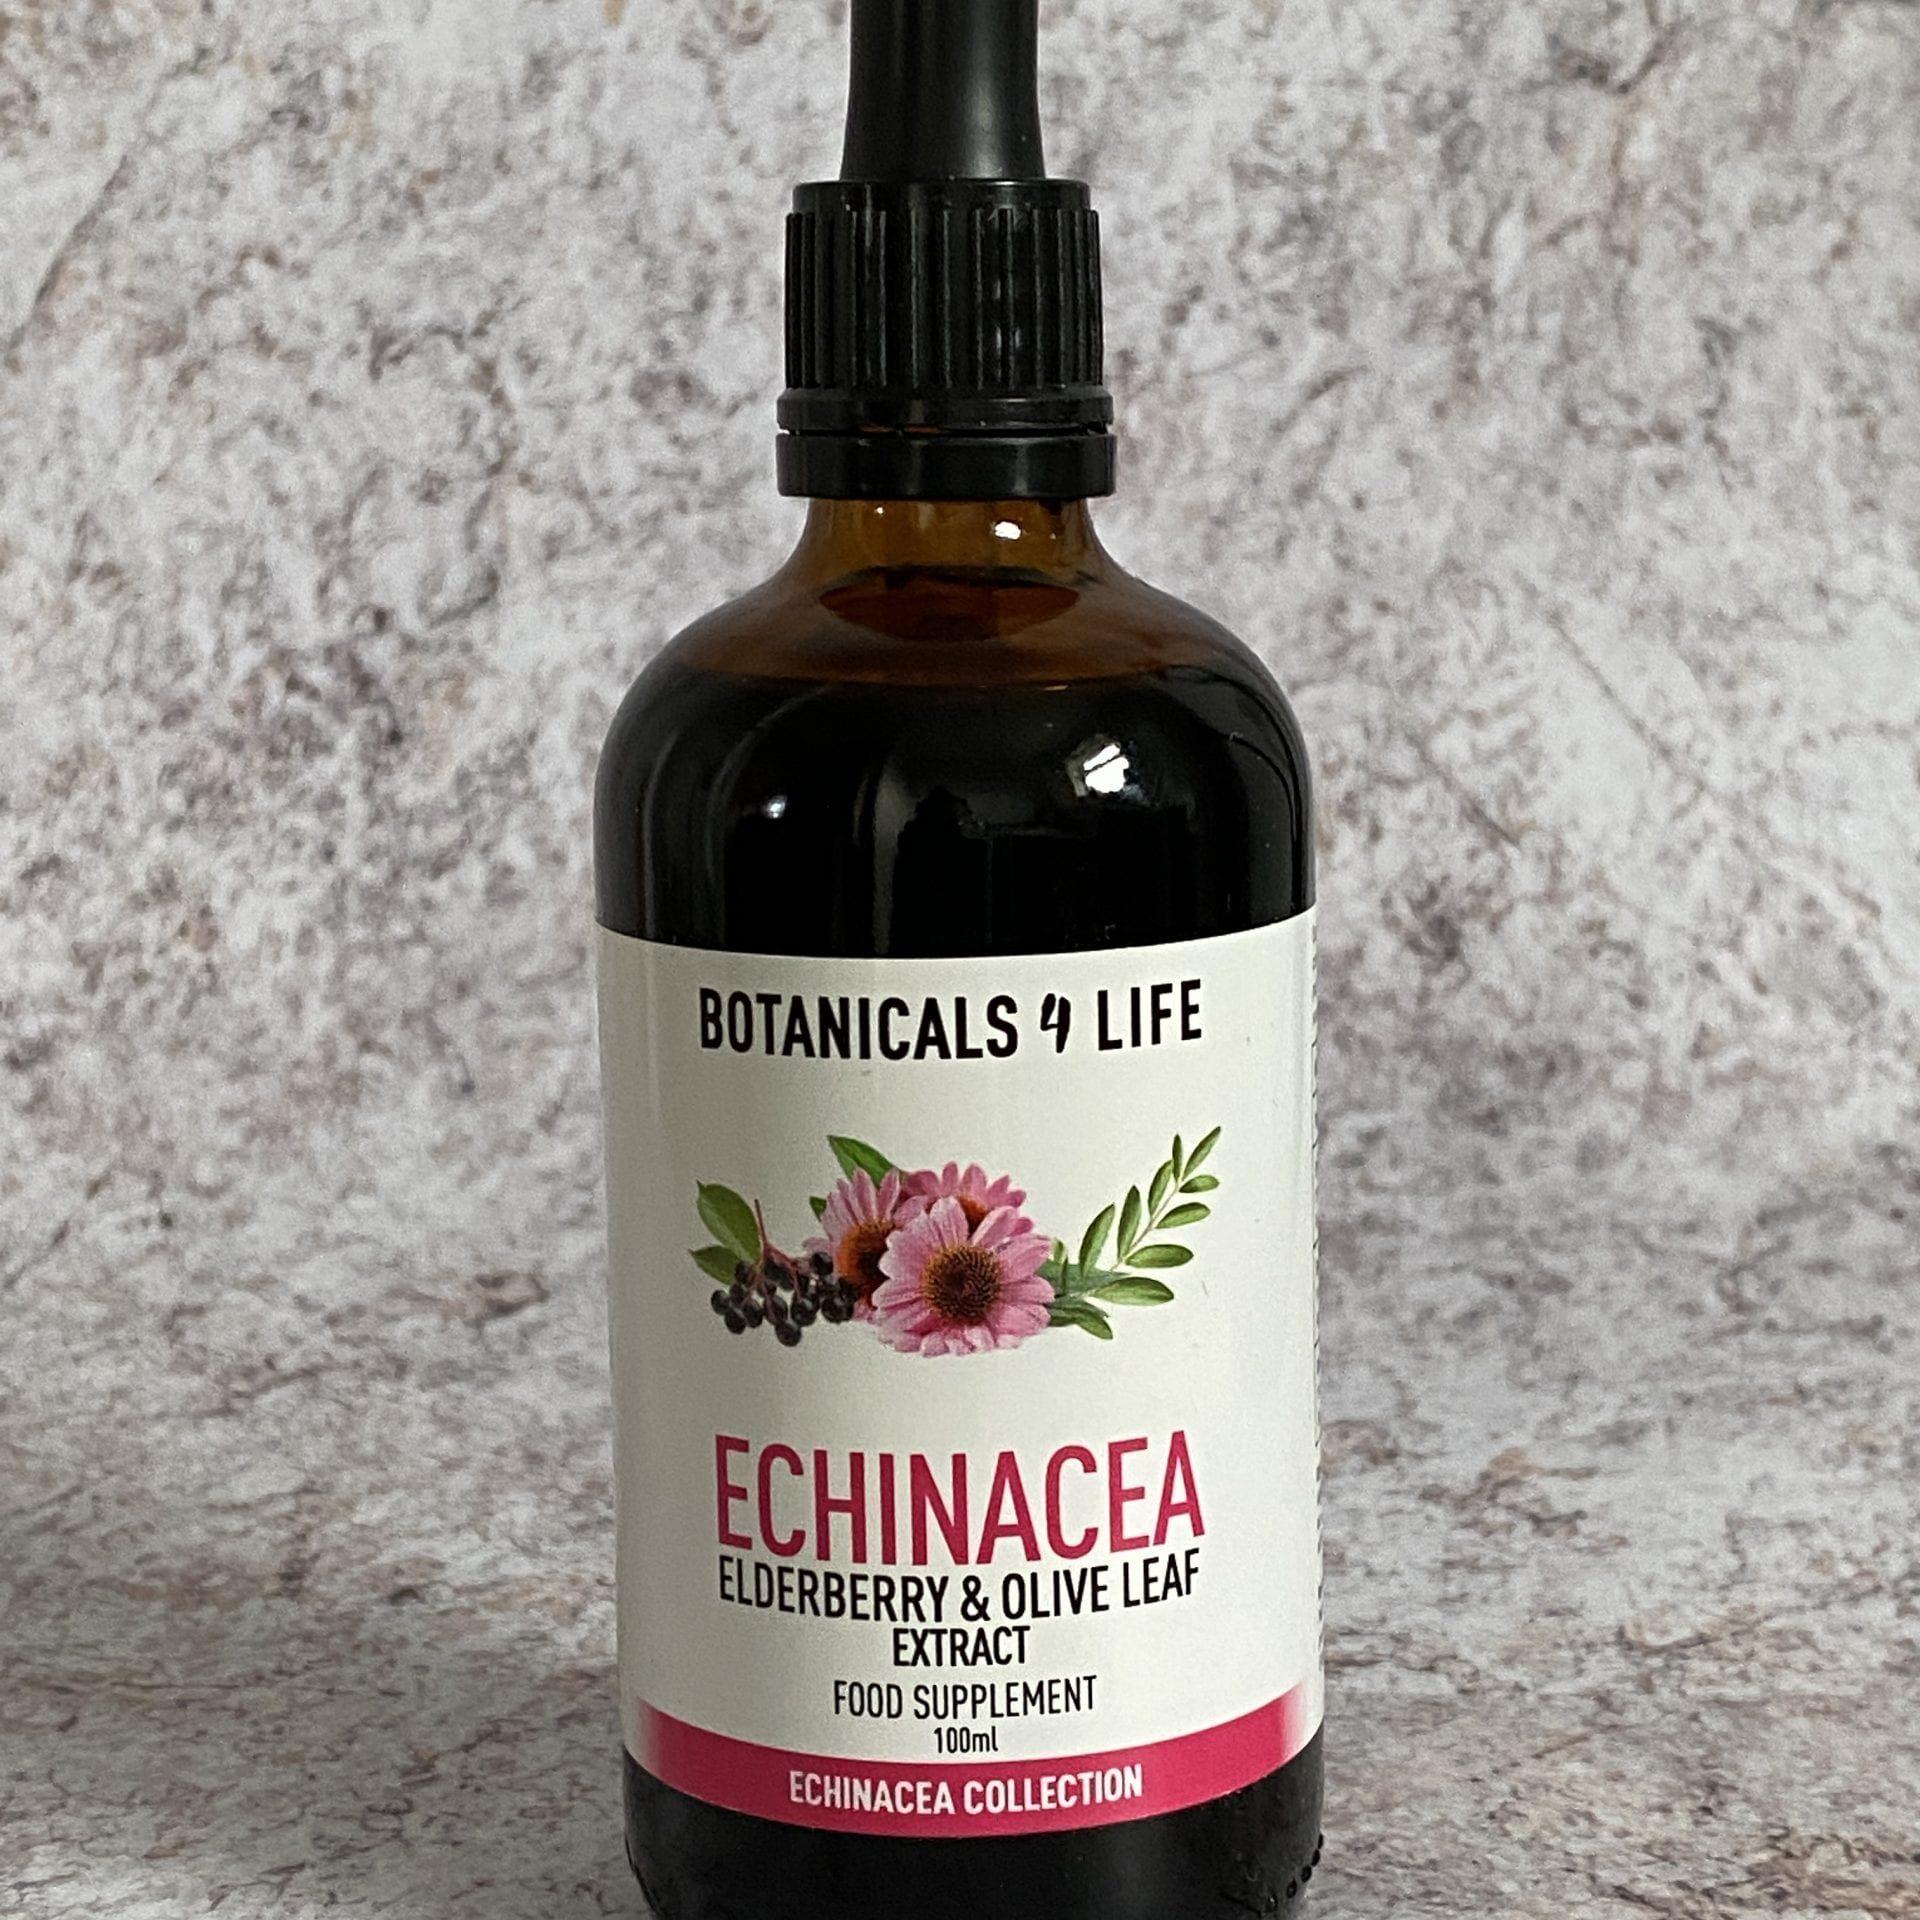 Sale - Botanicals 4 Life ECHINACEA, ELDERBERRY, OLIVE LEAF EXTRACT 100ML